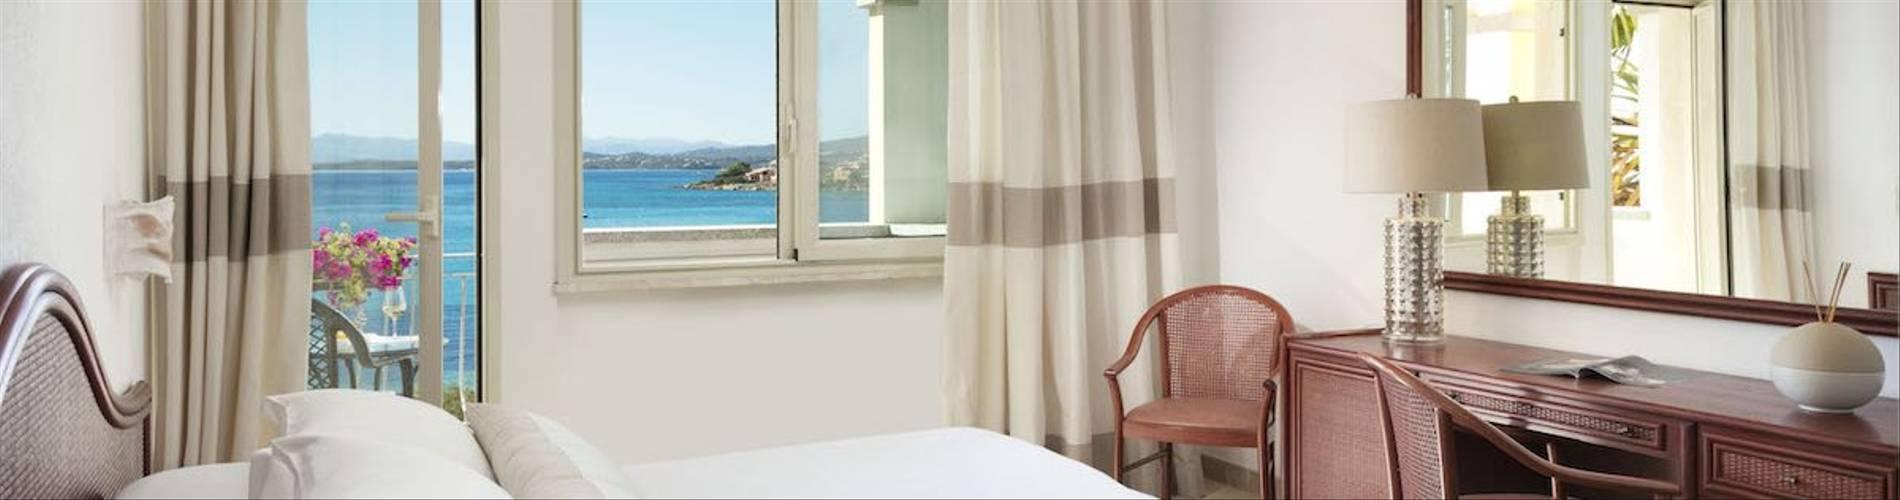 Comfort Sea View - Gabbiano Azzurro Hotel _ Suites Sardegna - web2.jpg